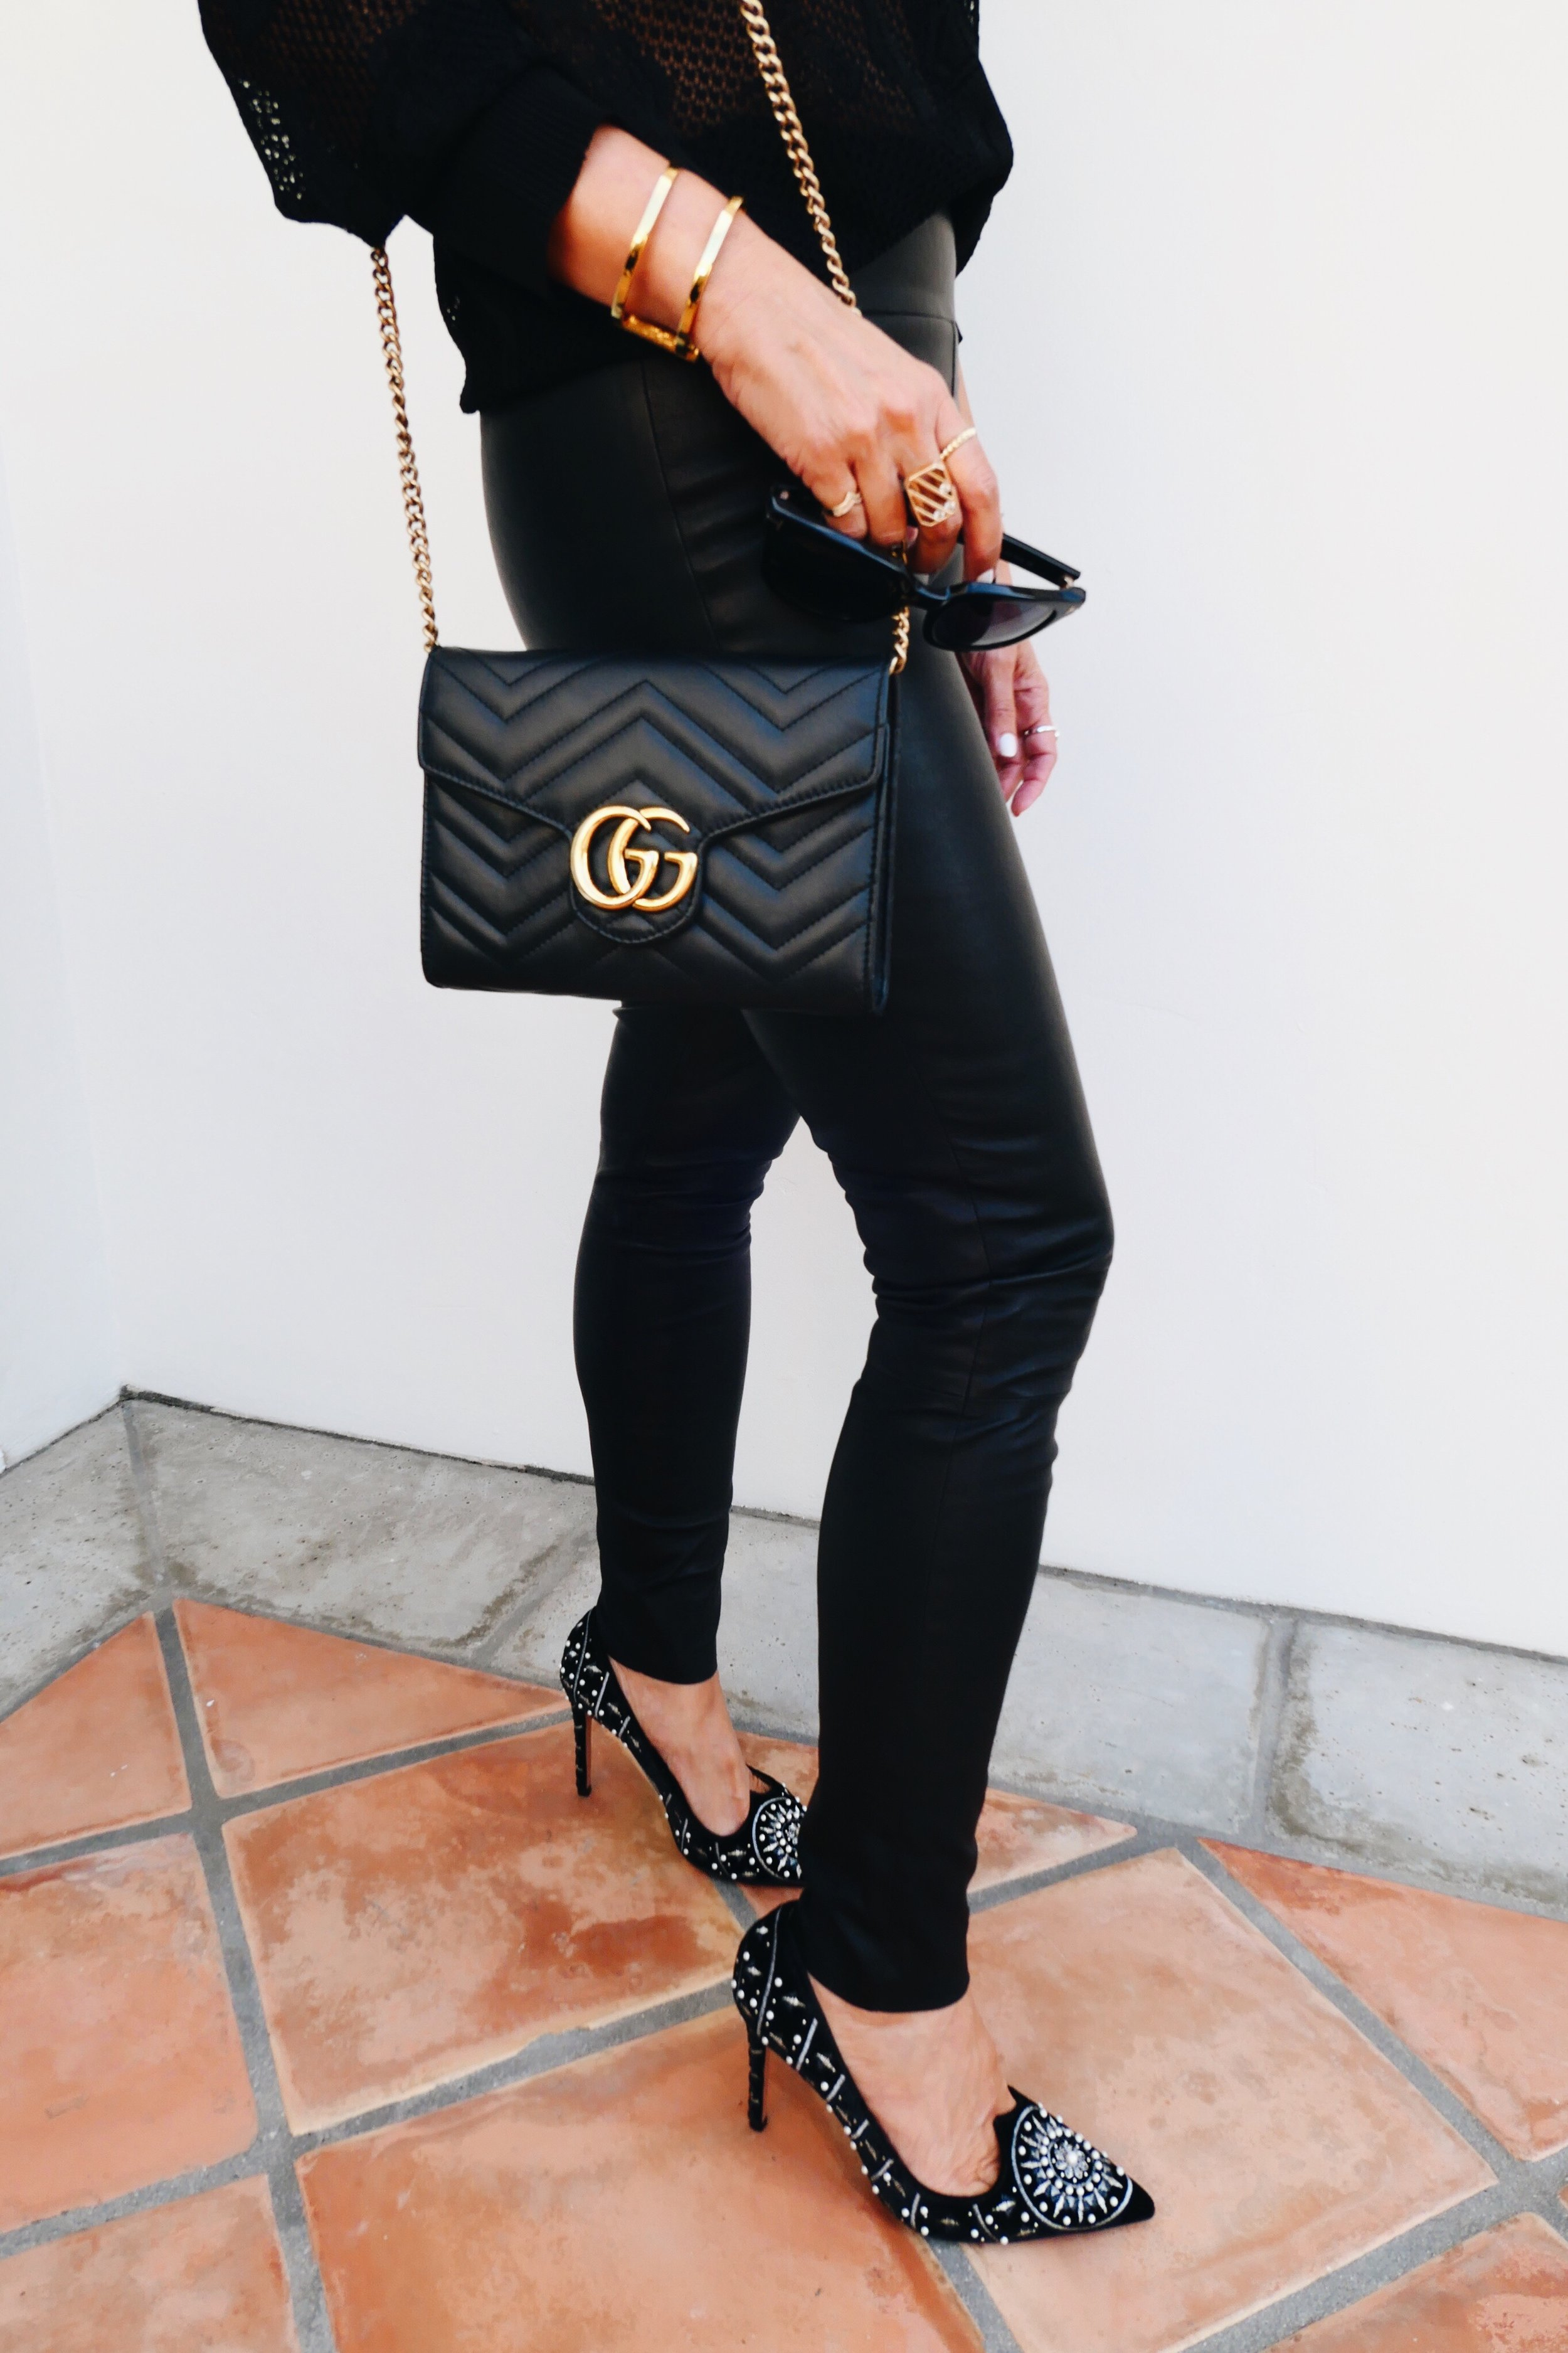 Melissa Meyers + Staci Koonel + Chanel + Aquazurra + Gucci + Tom Ford